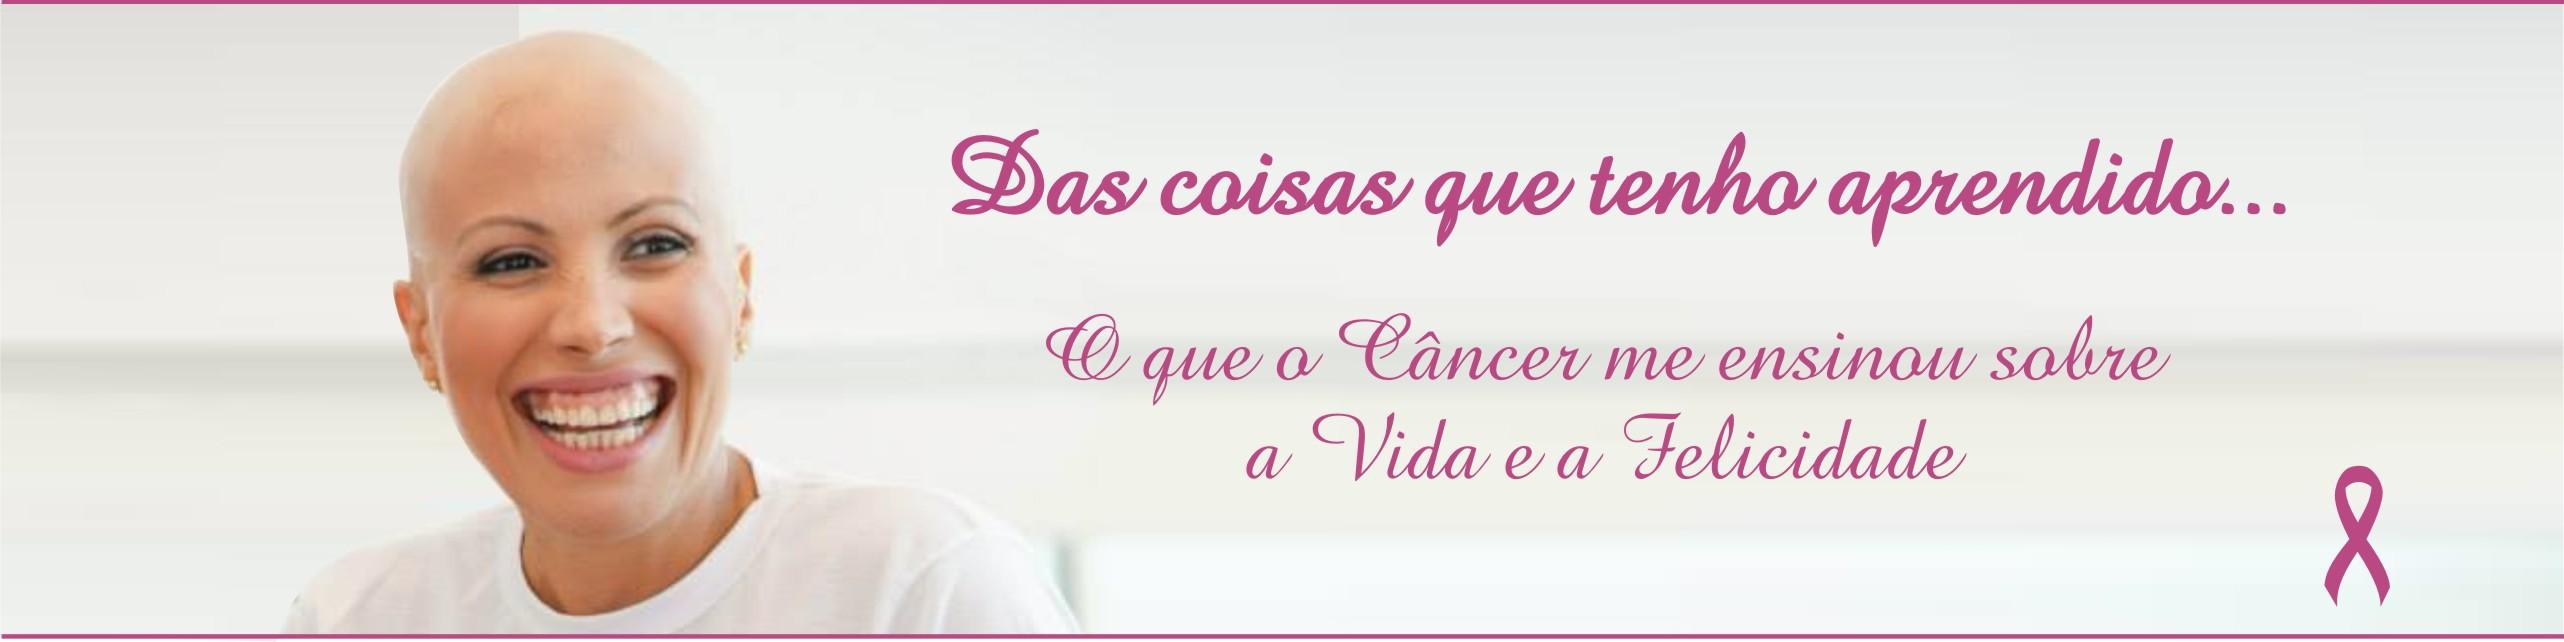 Como Enfrentar o Câncer Quimioterapia Tratamento